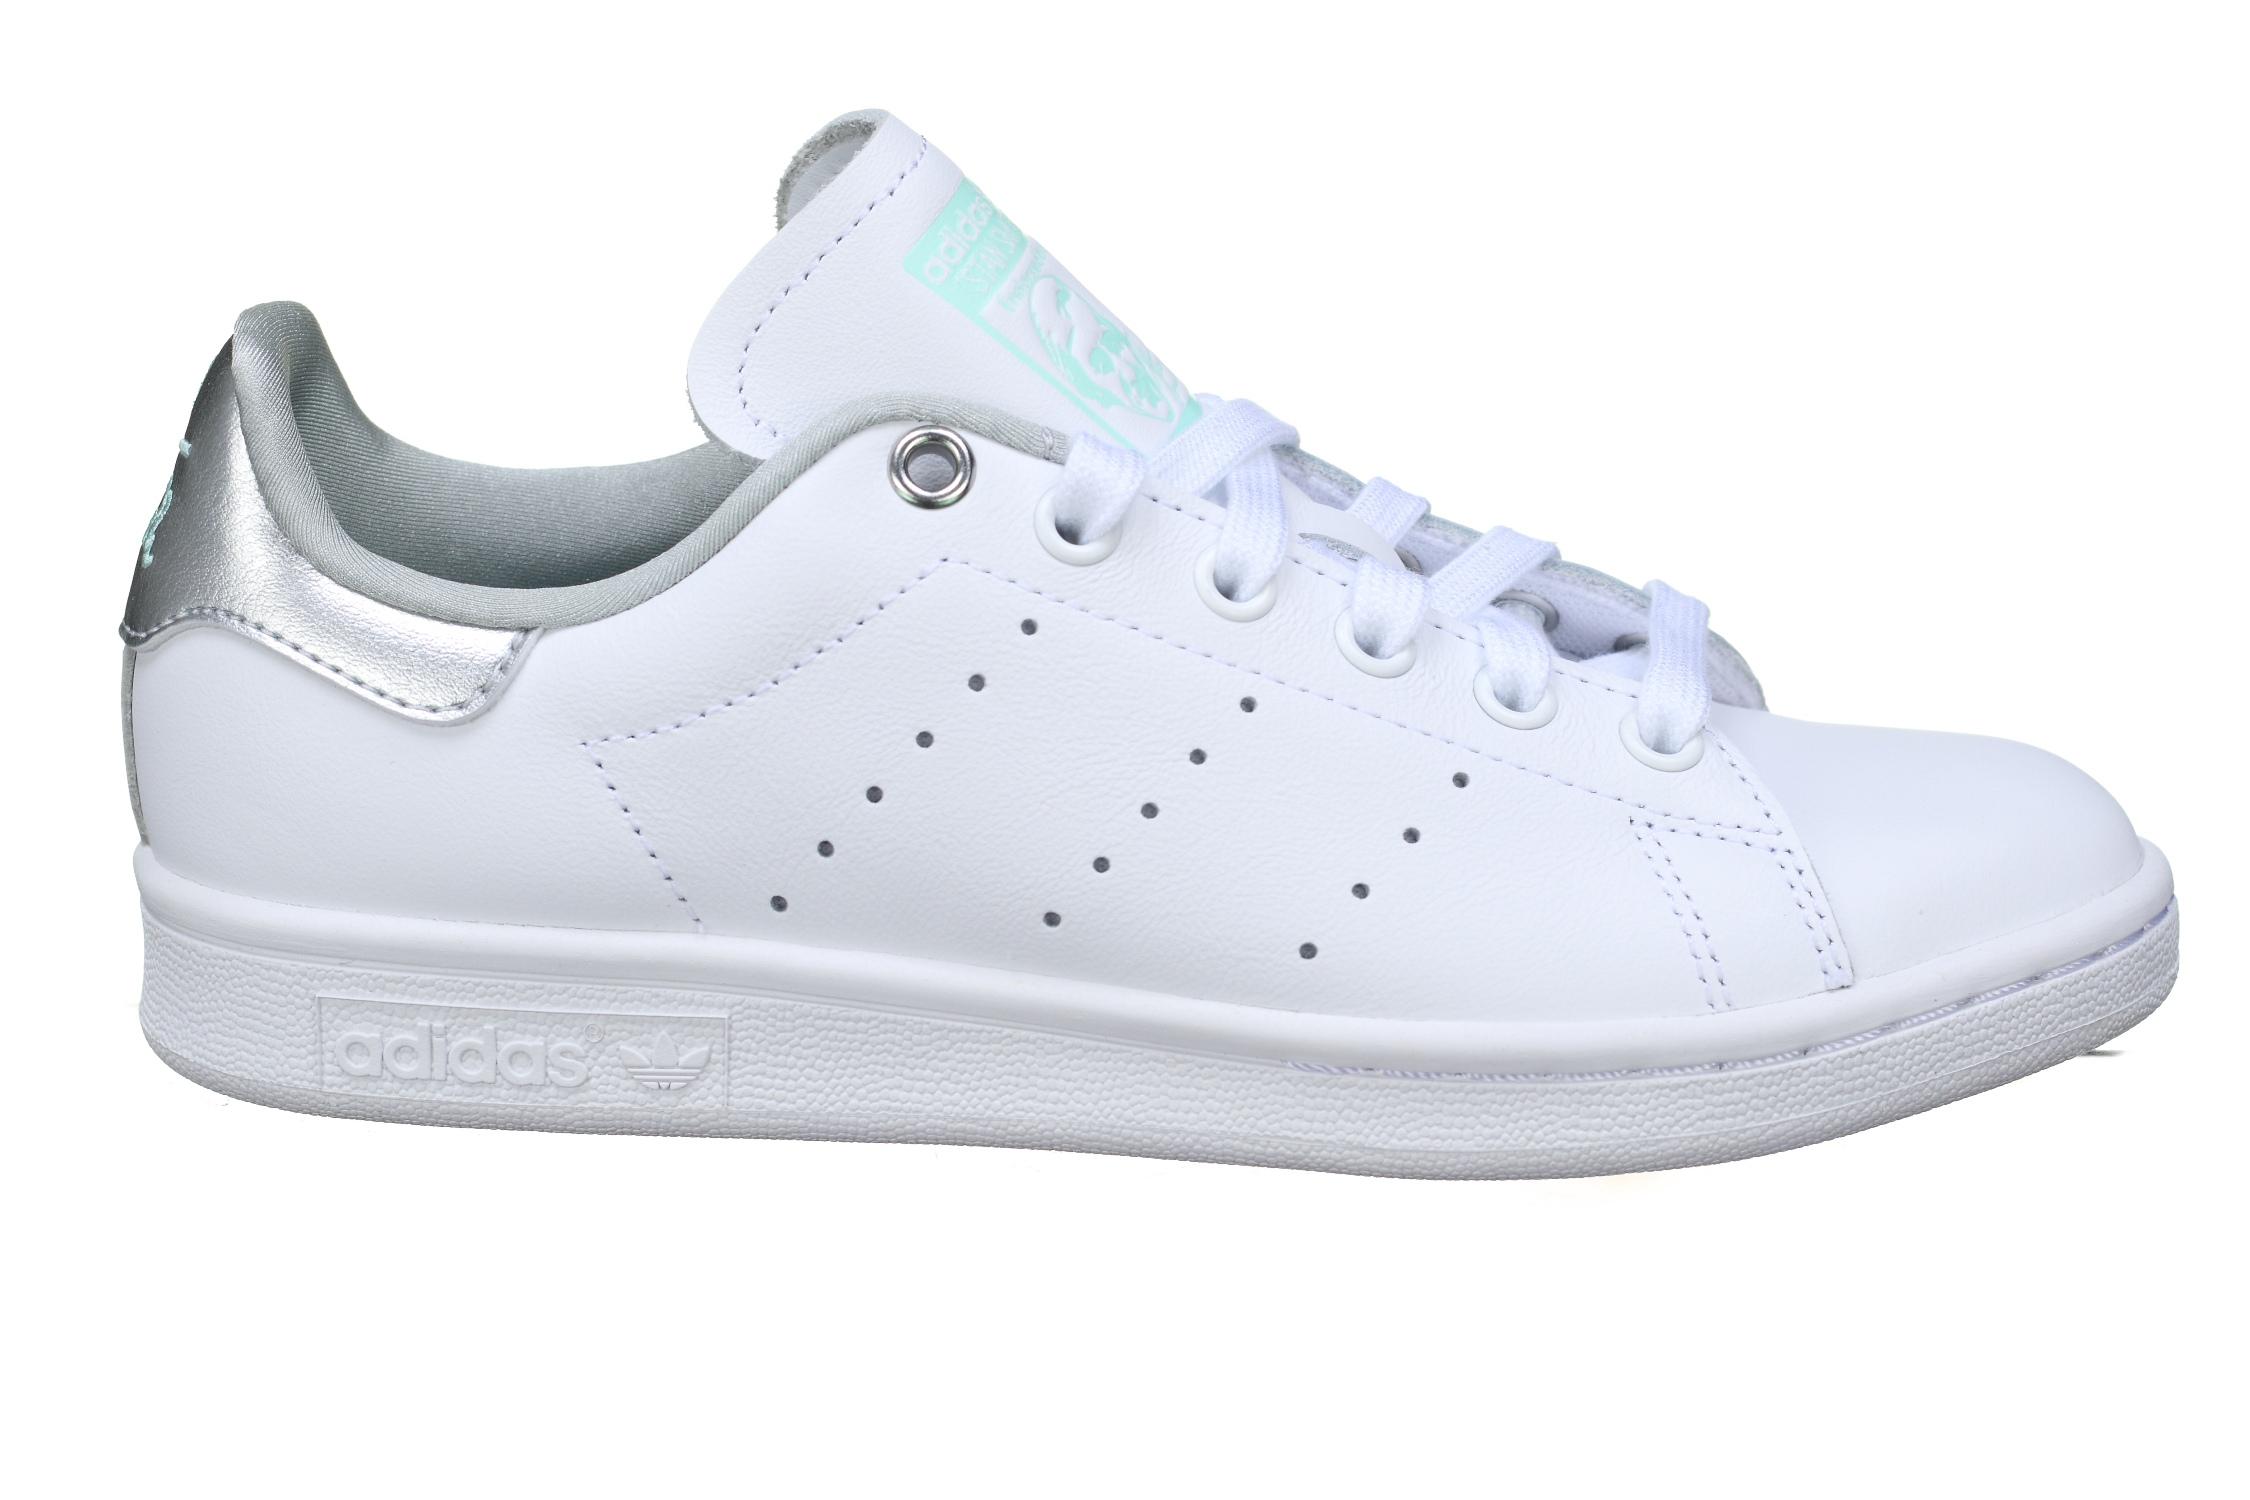 http://www.leadermode.com/172442/adidas-stan-smith-w-g27907-blanc.jpg